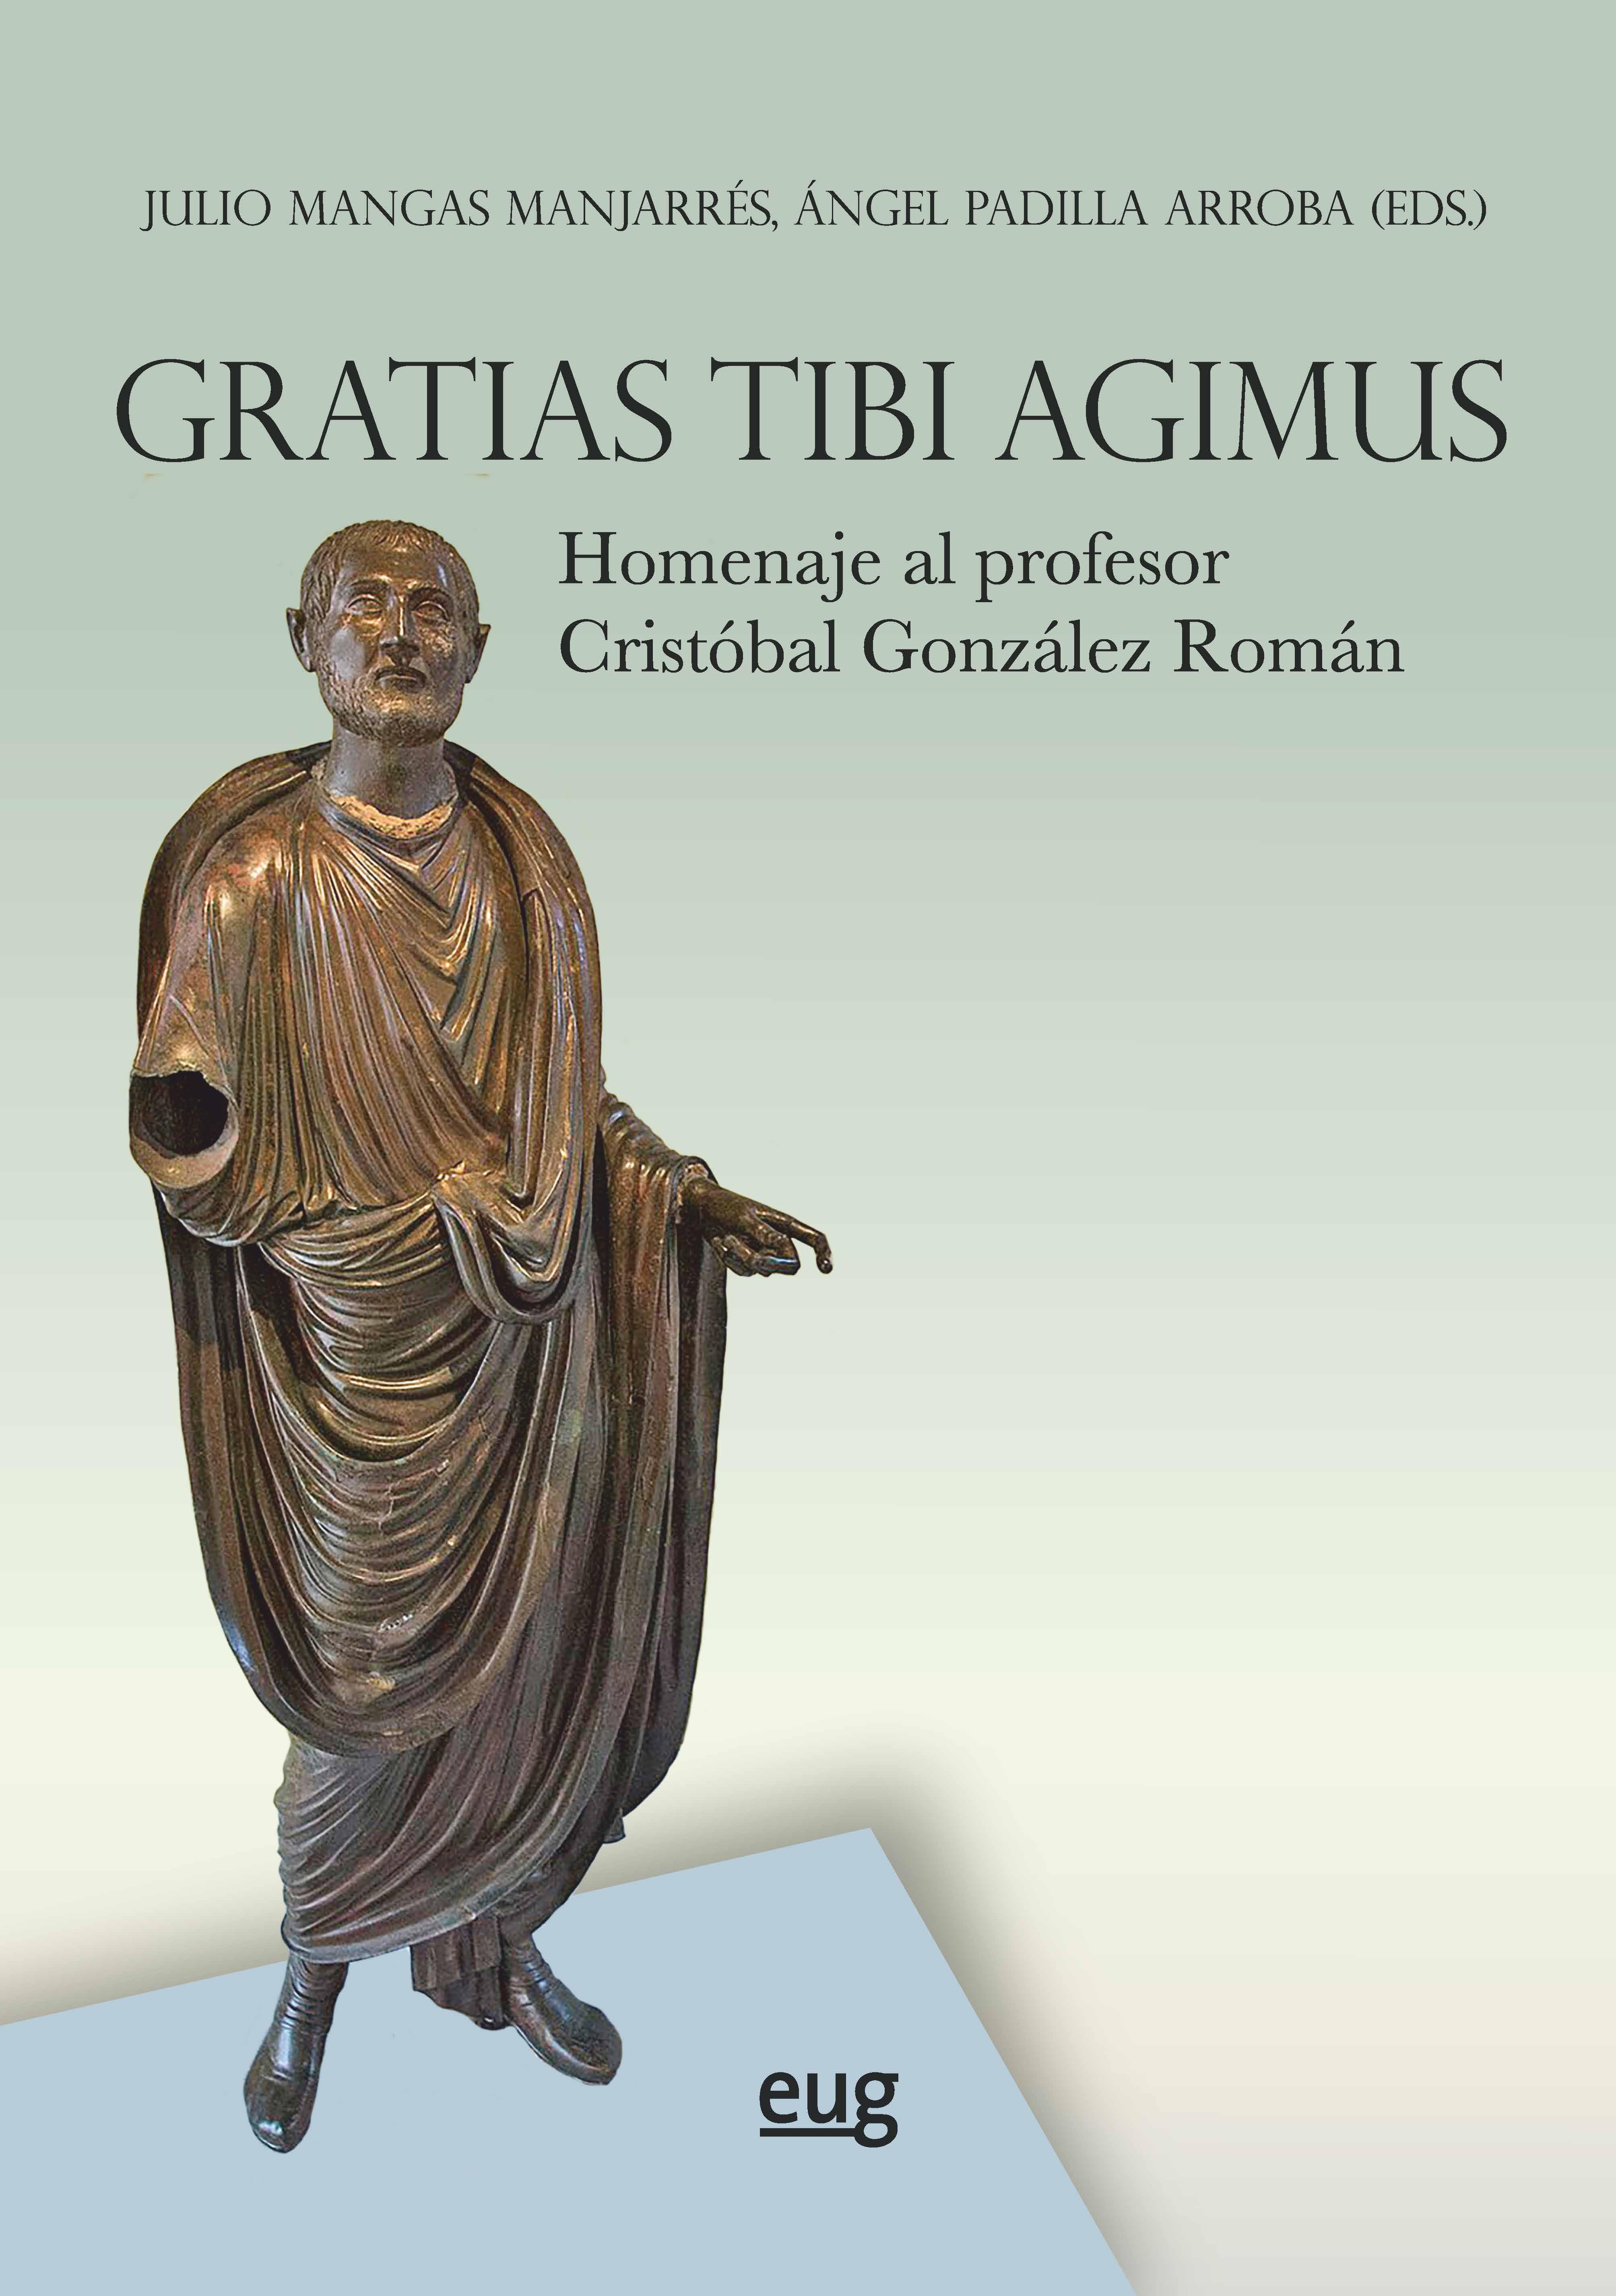 Gratias tibi agimus   «homenaje al profesor Cristóbal Román»